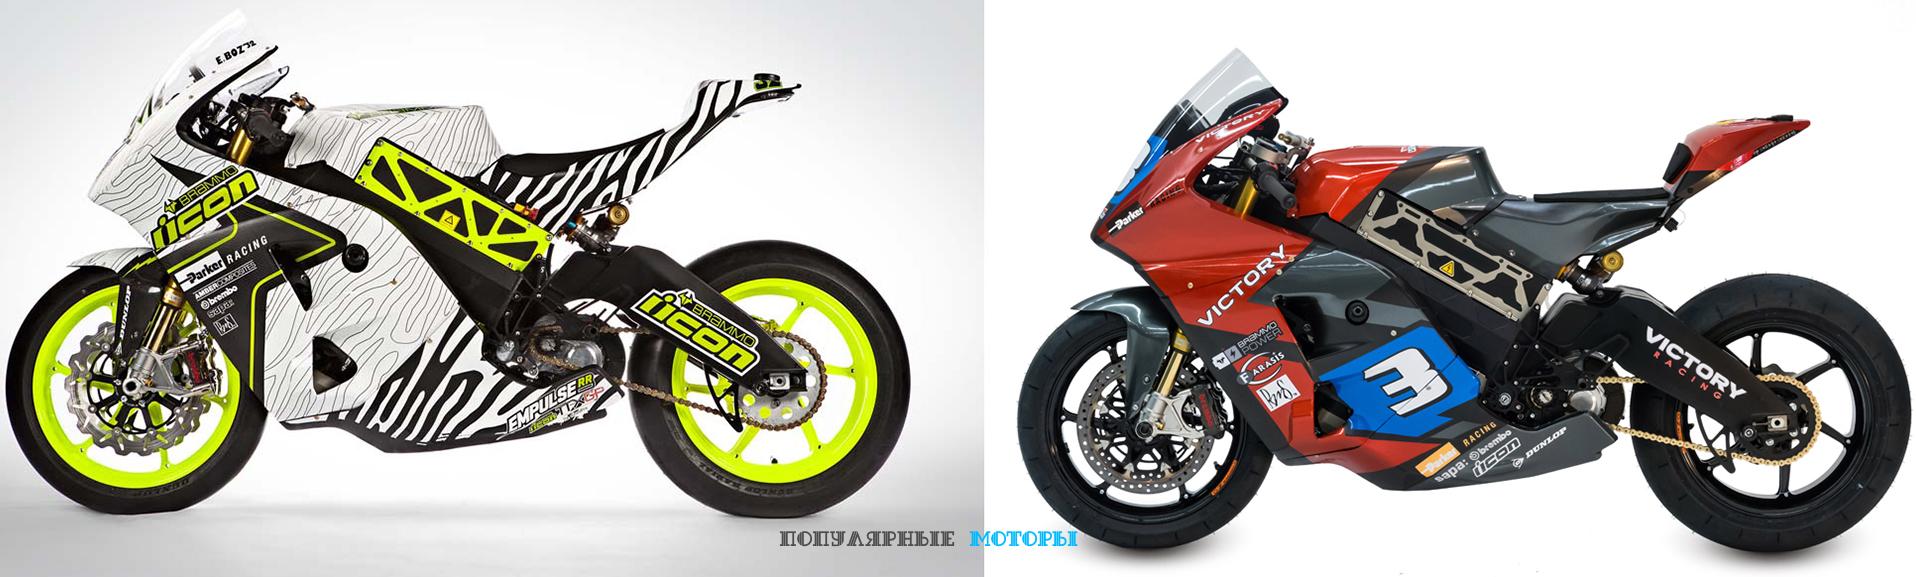 Компания Victory представит прототип электрического мотоцикла на гонке Isle Of Man TT